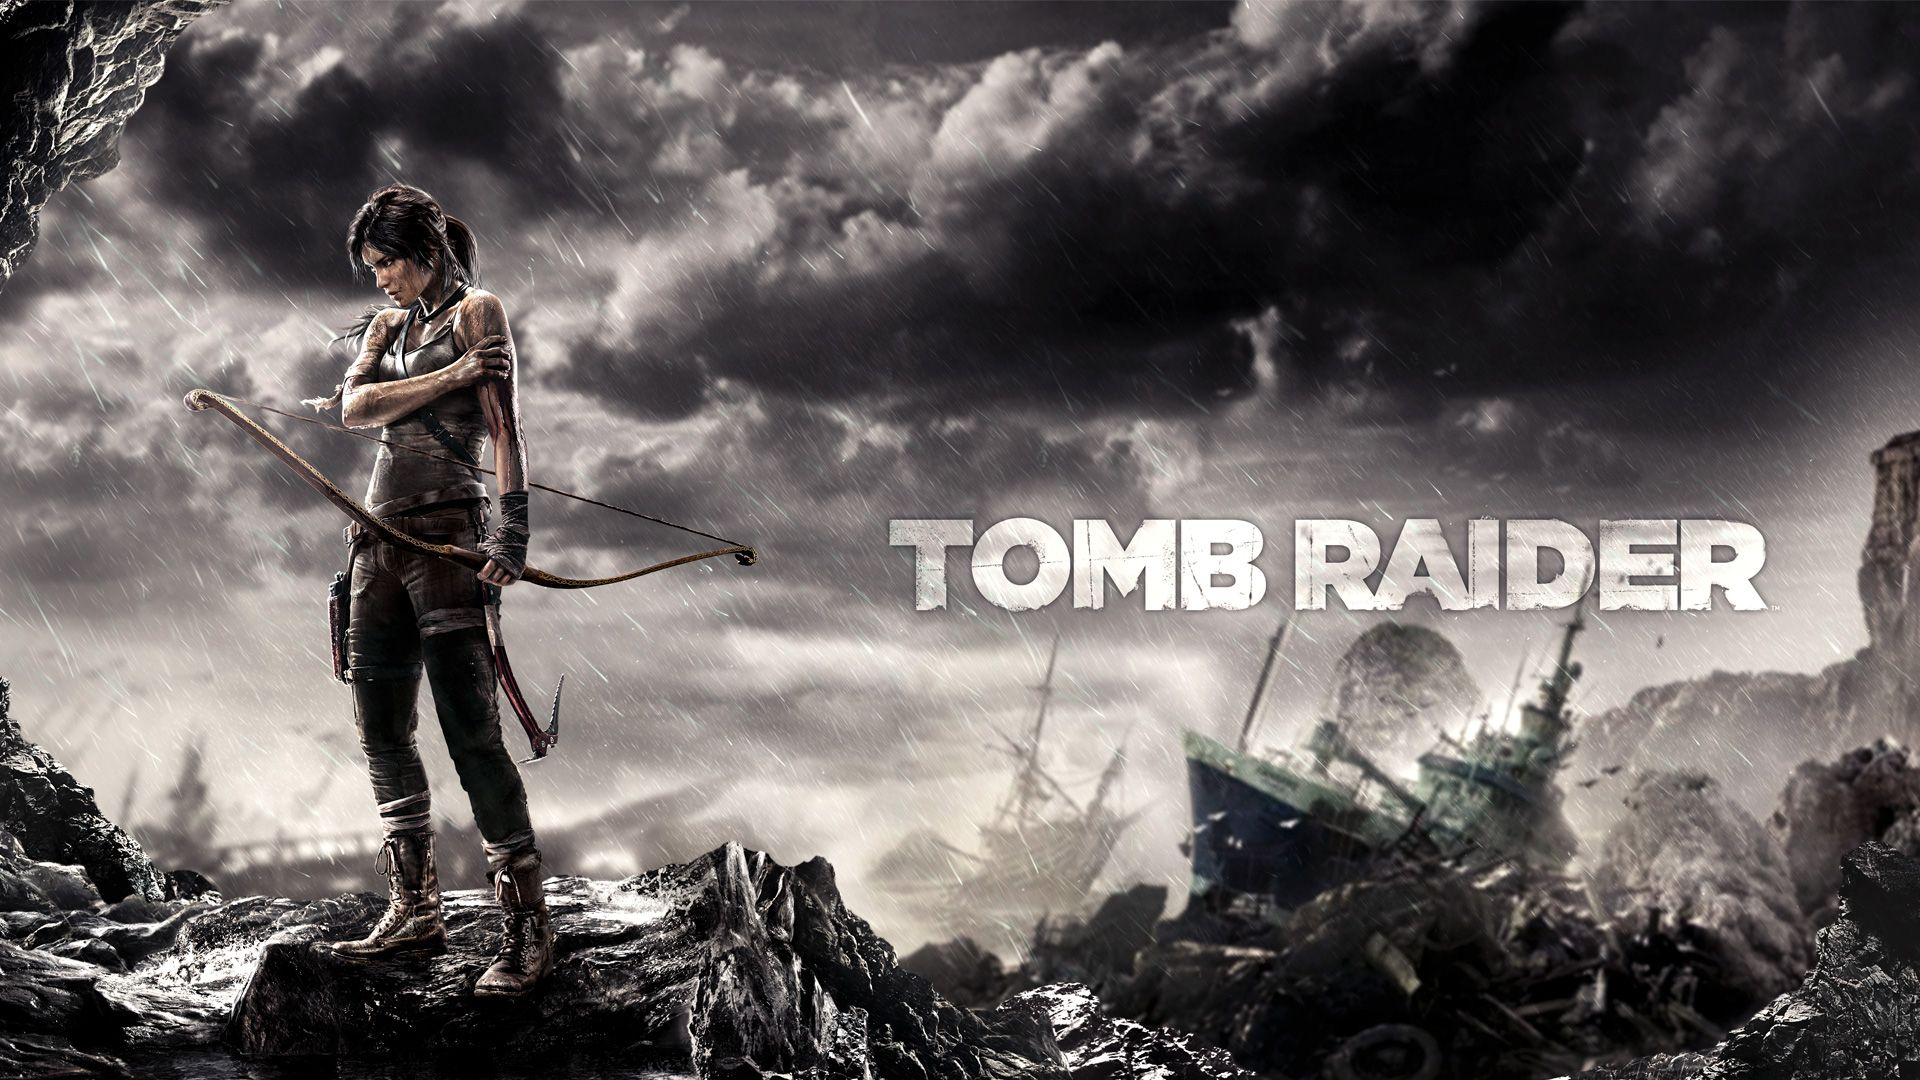 1920x1080 точек Tomb Raider Tomb Raider Game Tomb